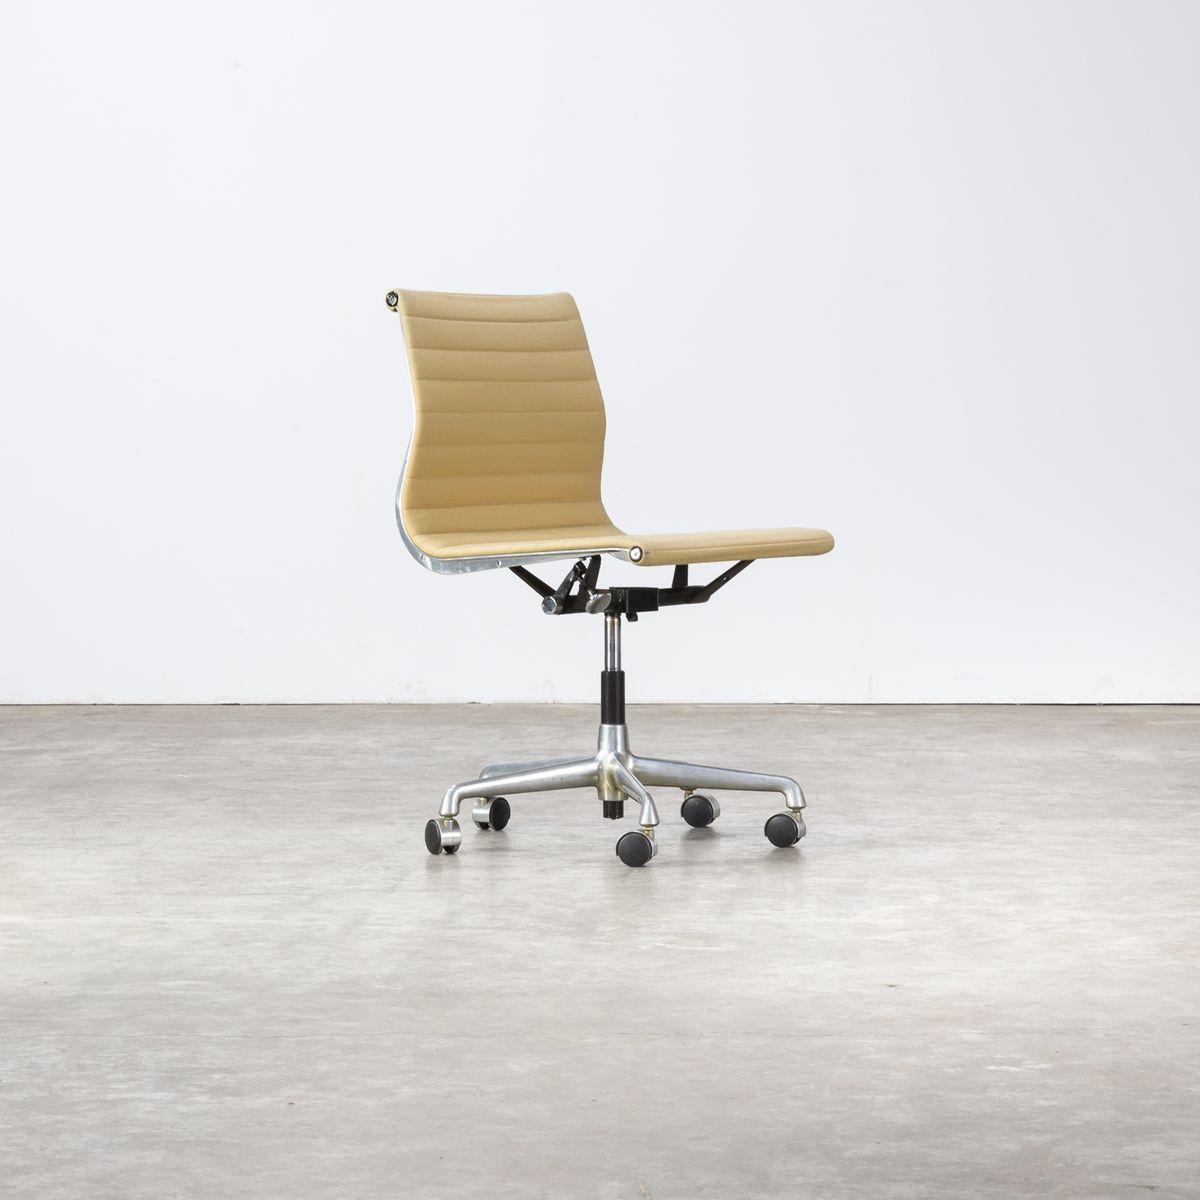 ea118 b rostuhl von charles ray eames f r herman miller 1970er bei pamono kaufen. Black Bedroom Furniture Sets. Home Design Ideas